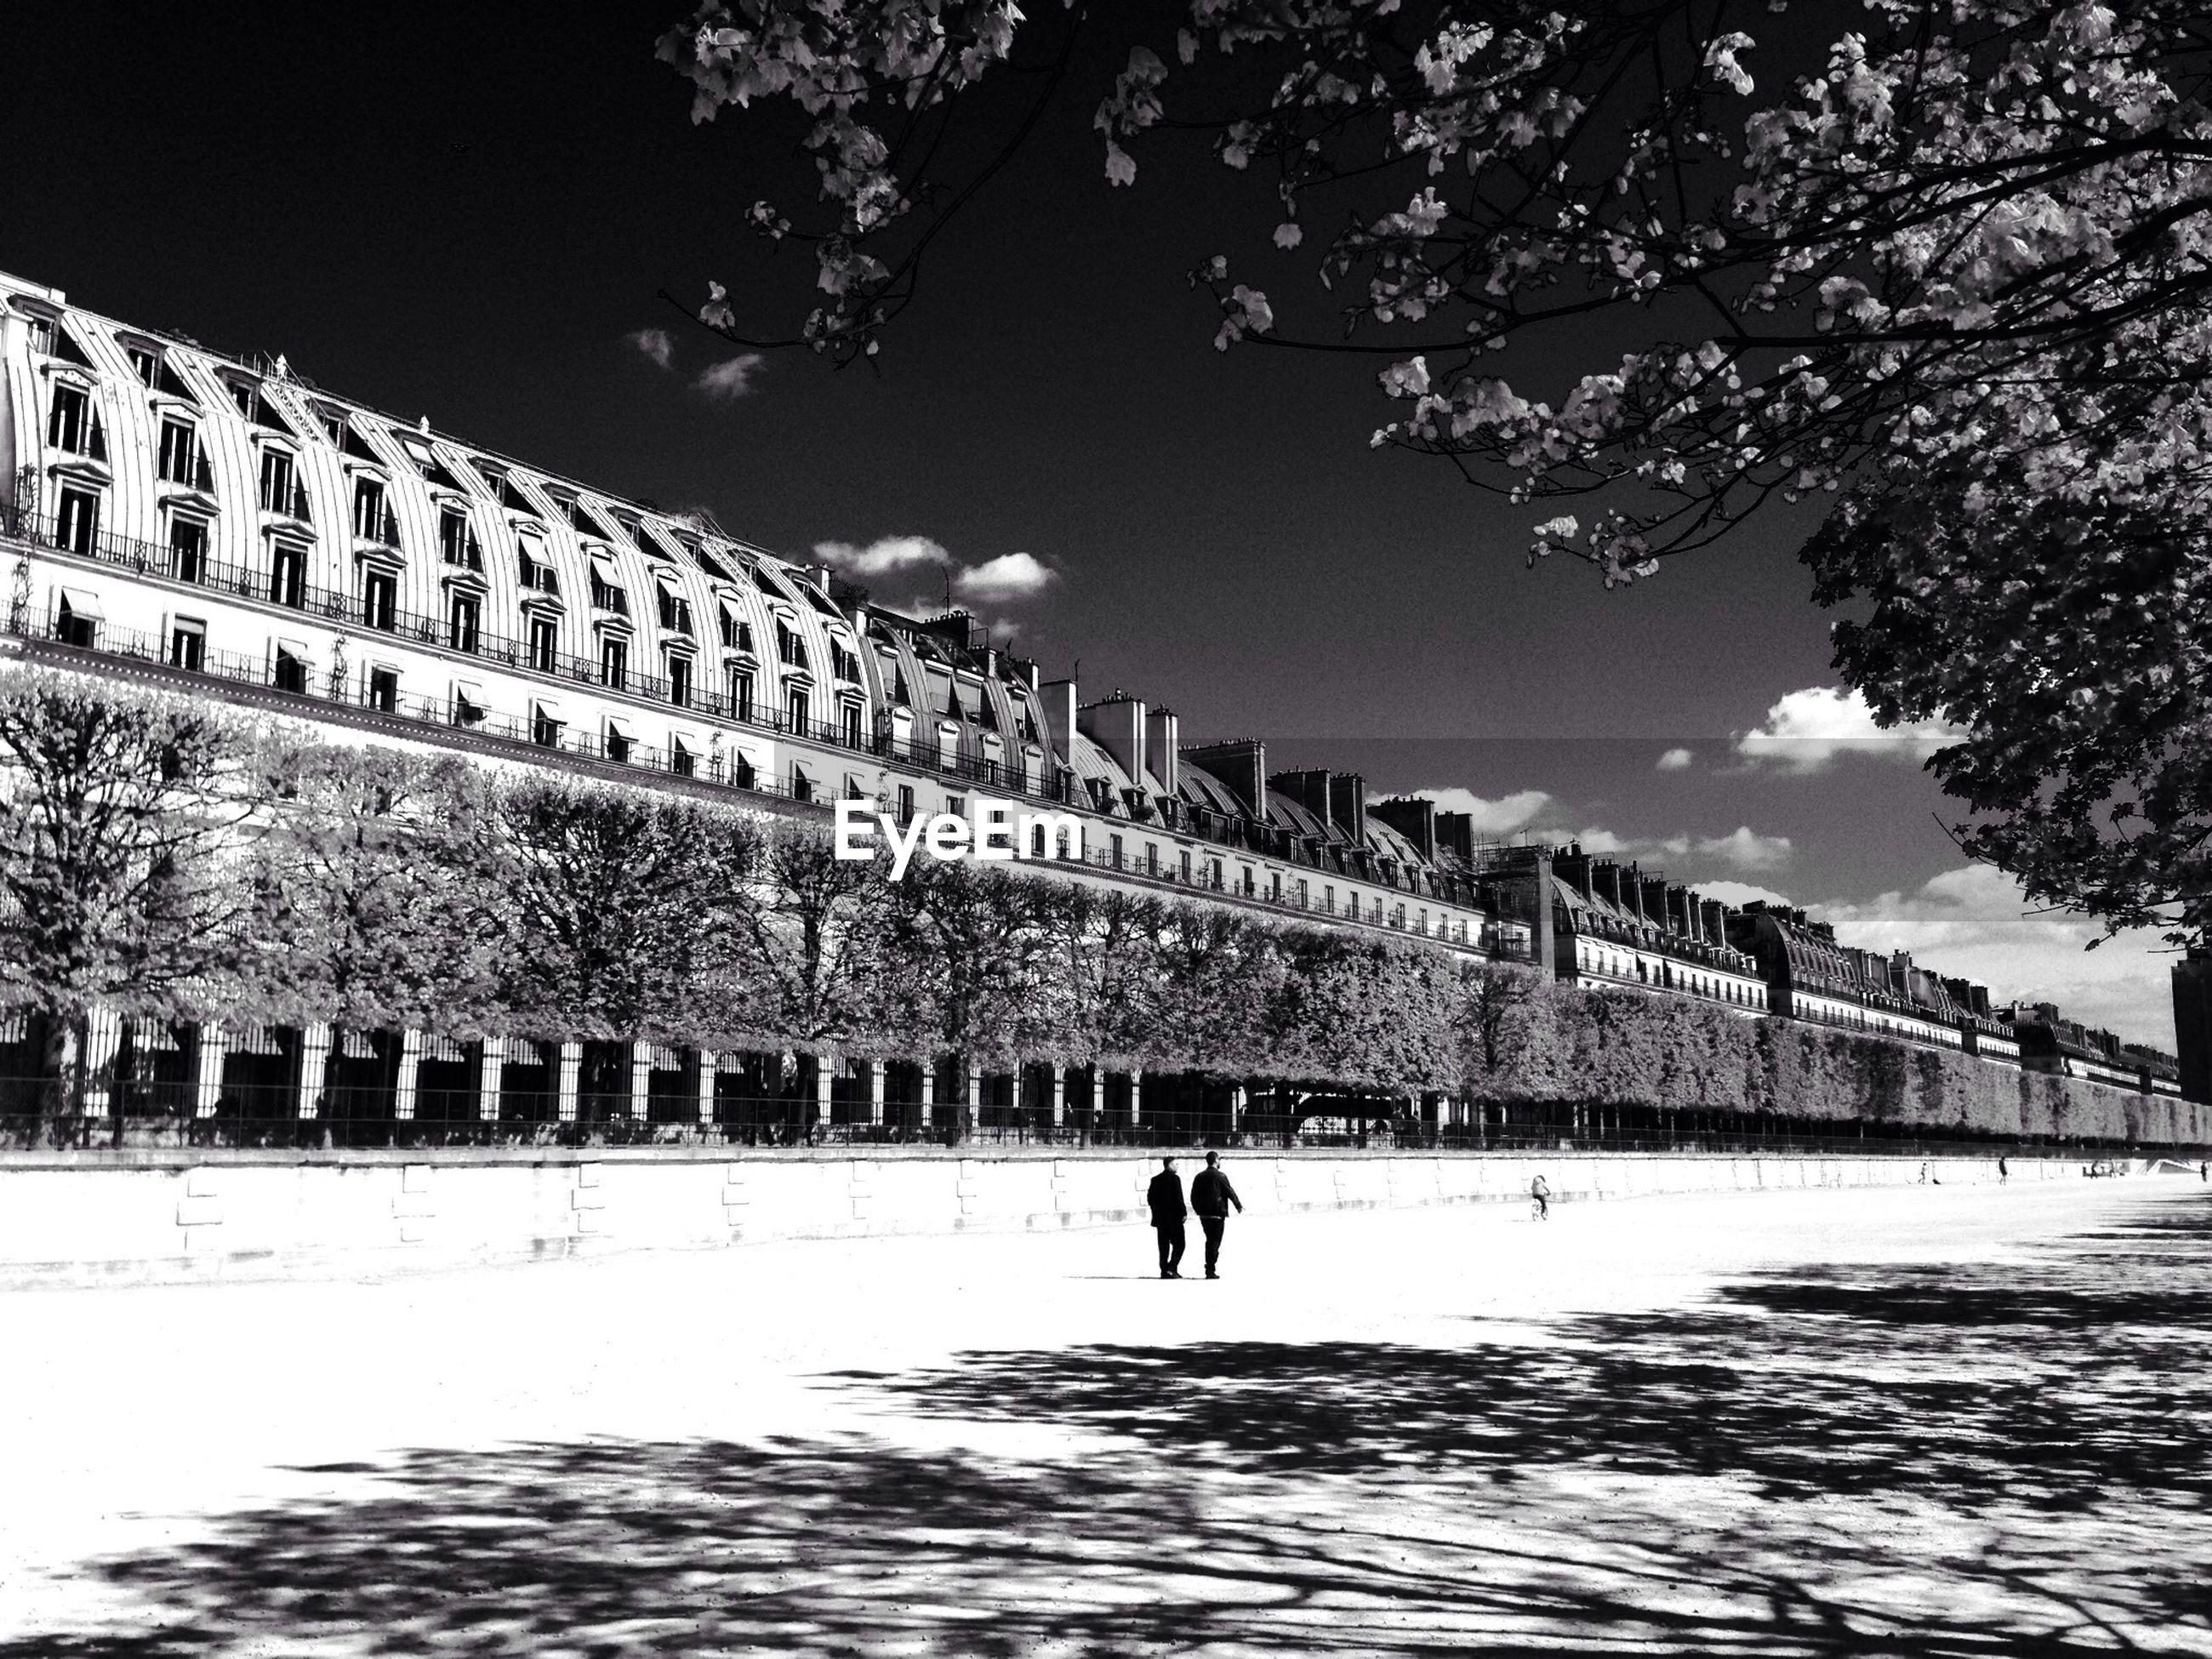 Facade of terrasse des feuillants against sky